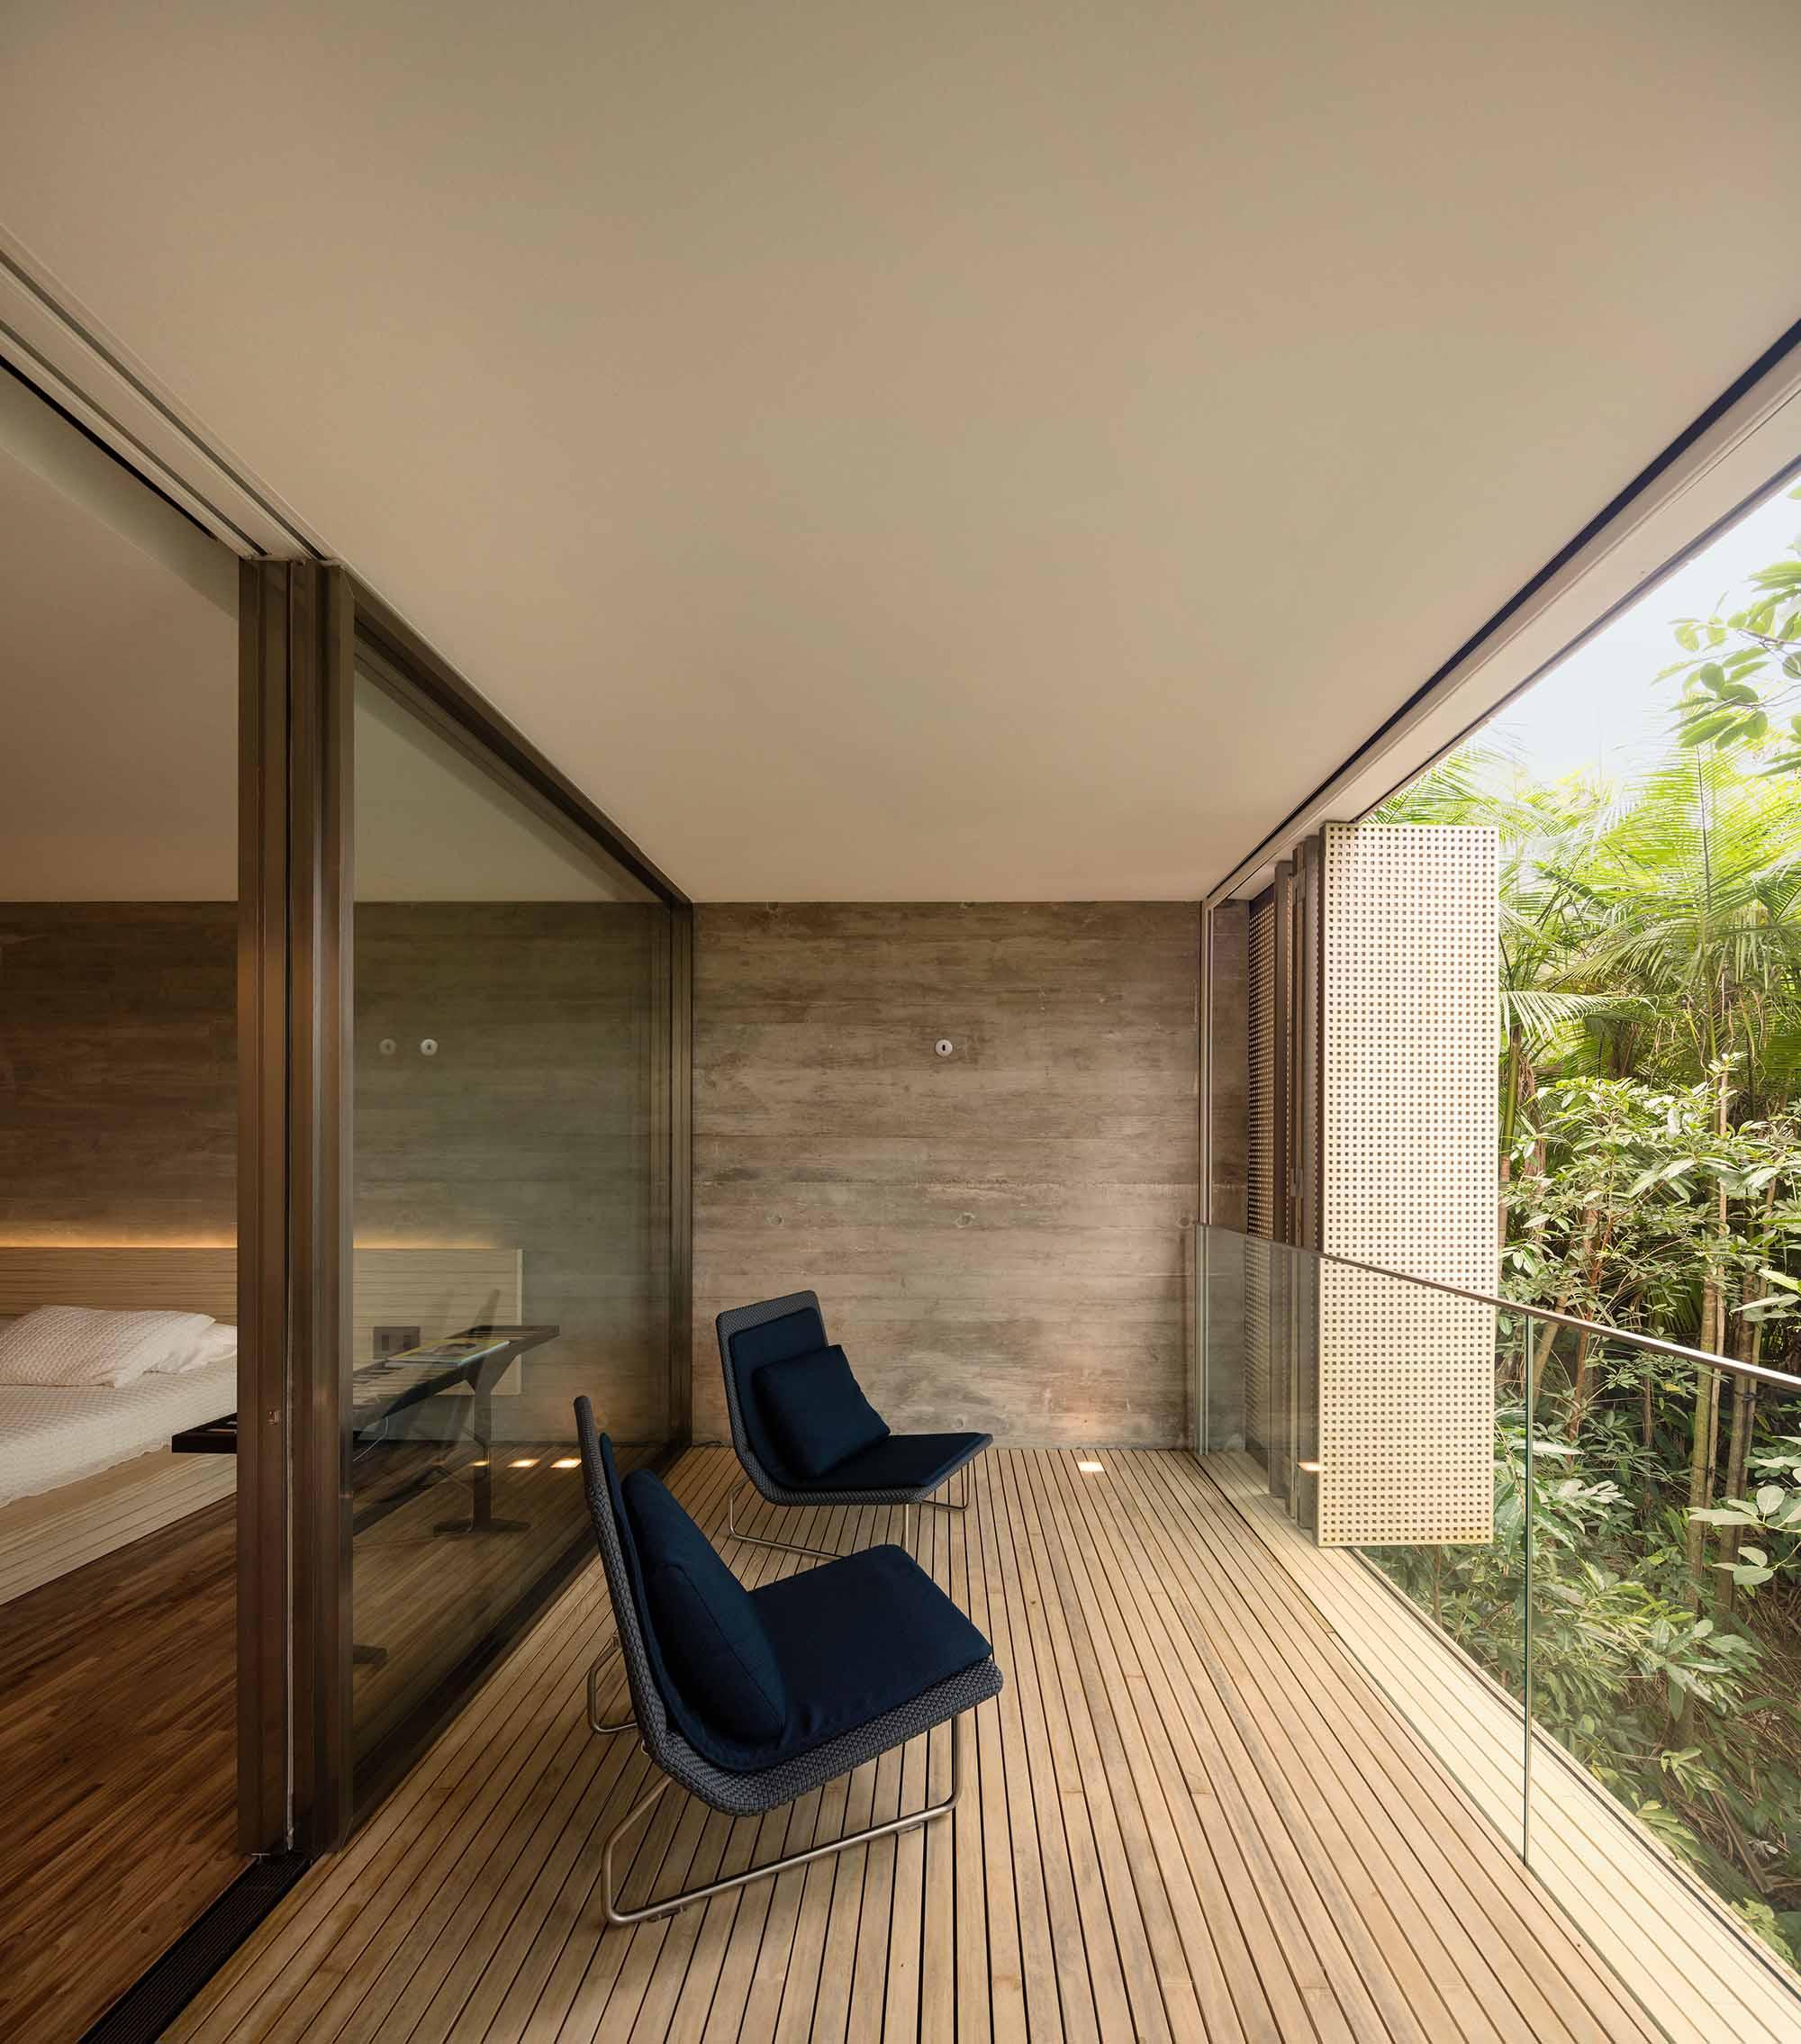 H-House-Life-Jungle-House-Casa-Da-Mata-studio-mk27-mk27_namata_fernandoguerra_medium(24).JPG